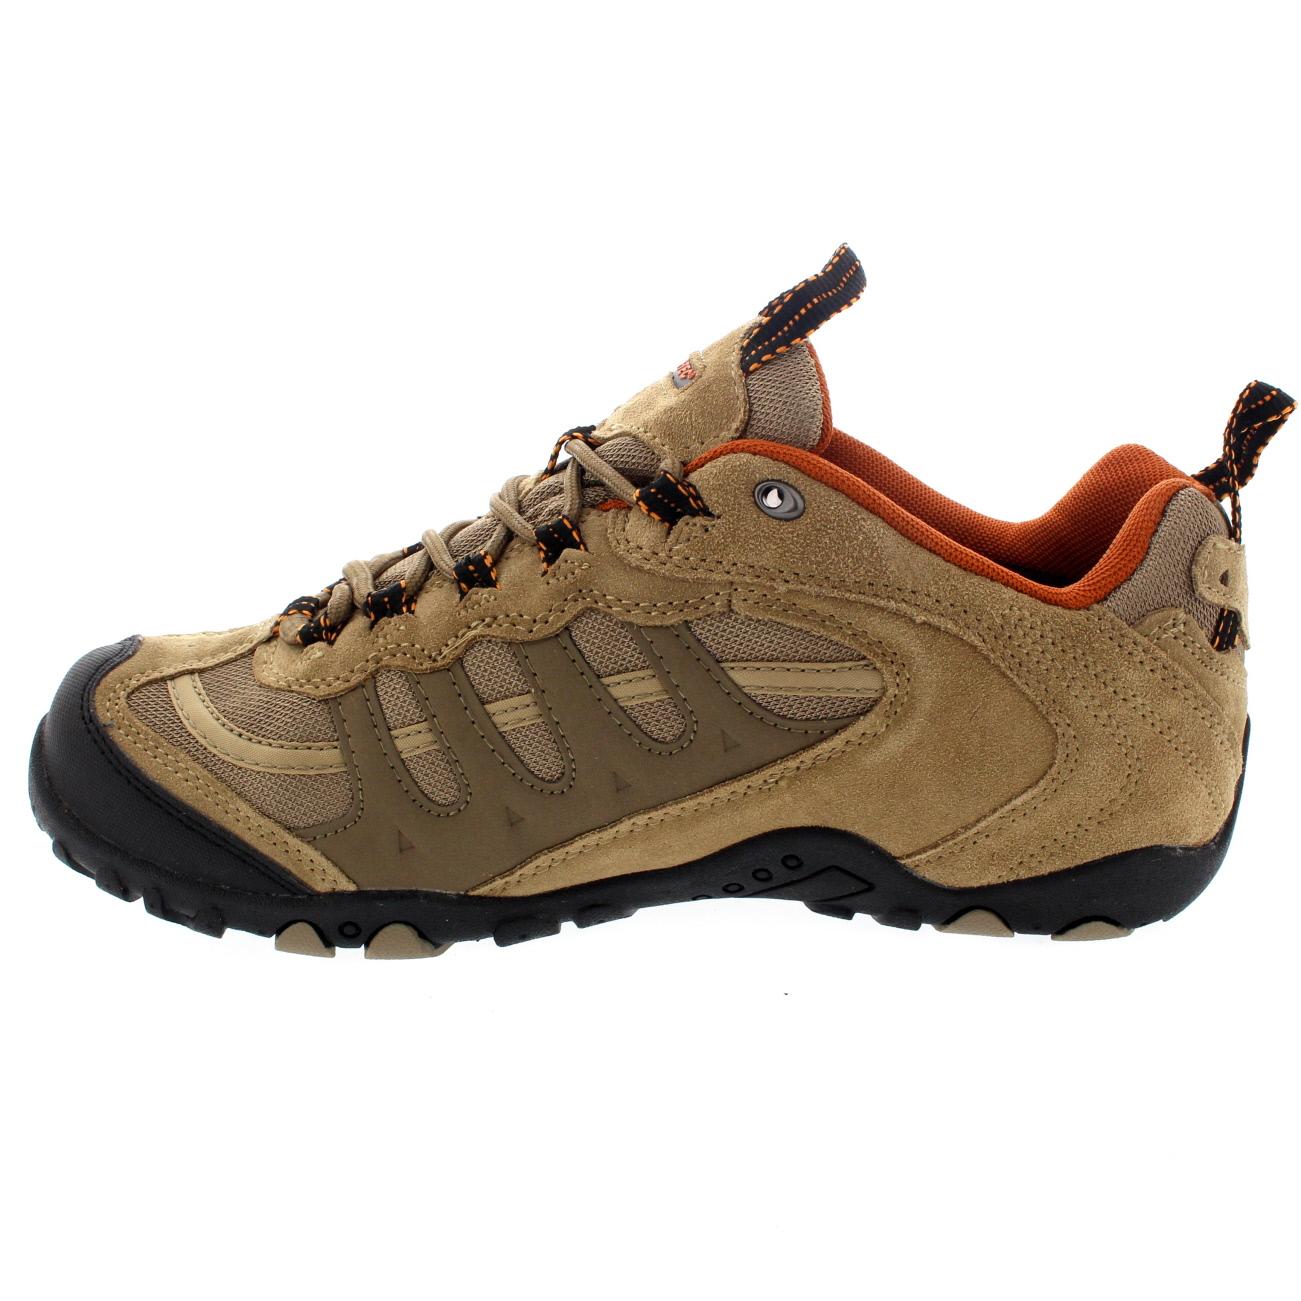 Mens Hi Tec Waterproof Hiking Walking Shoes